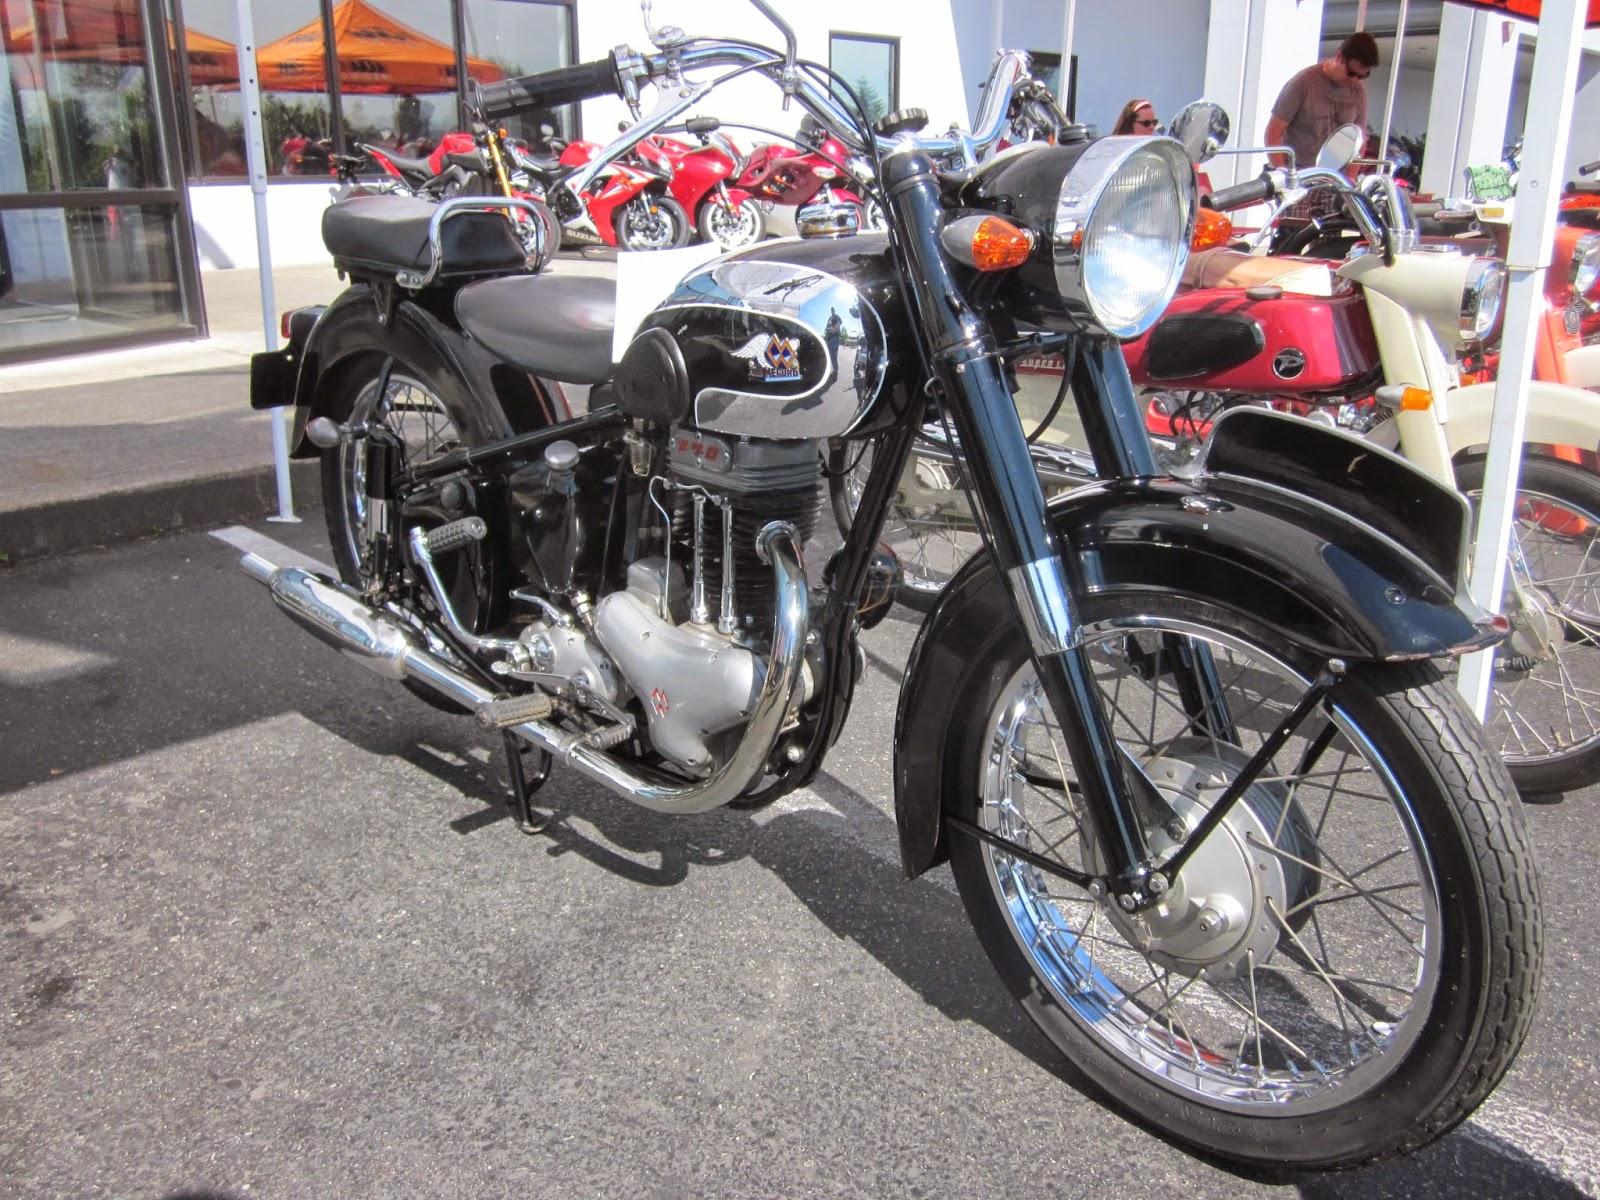 oldmotodude: 1957 meguro s3 on display at the 2014 vjmc-hinshaw's